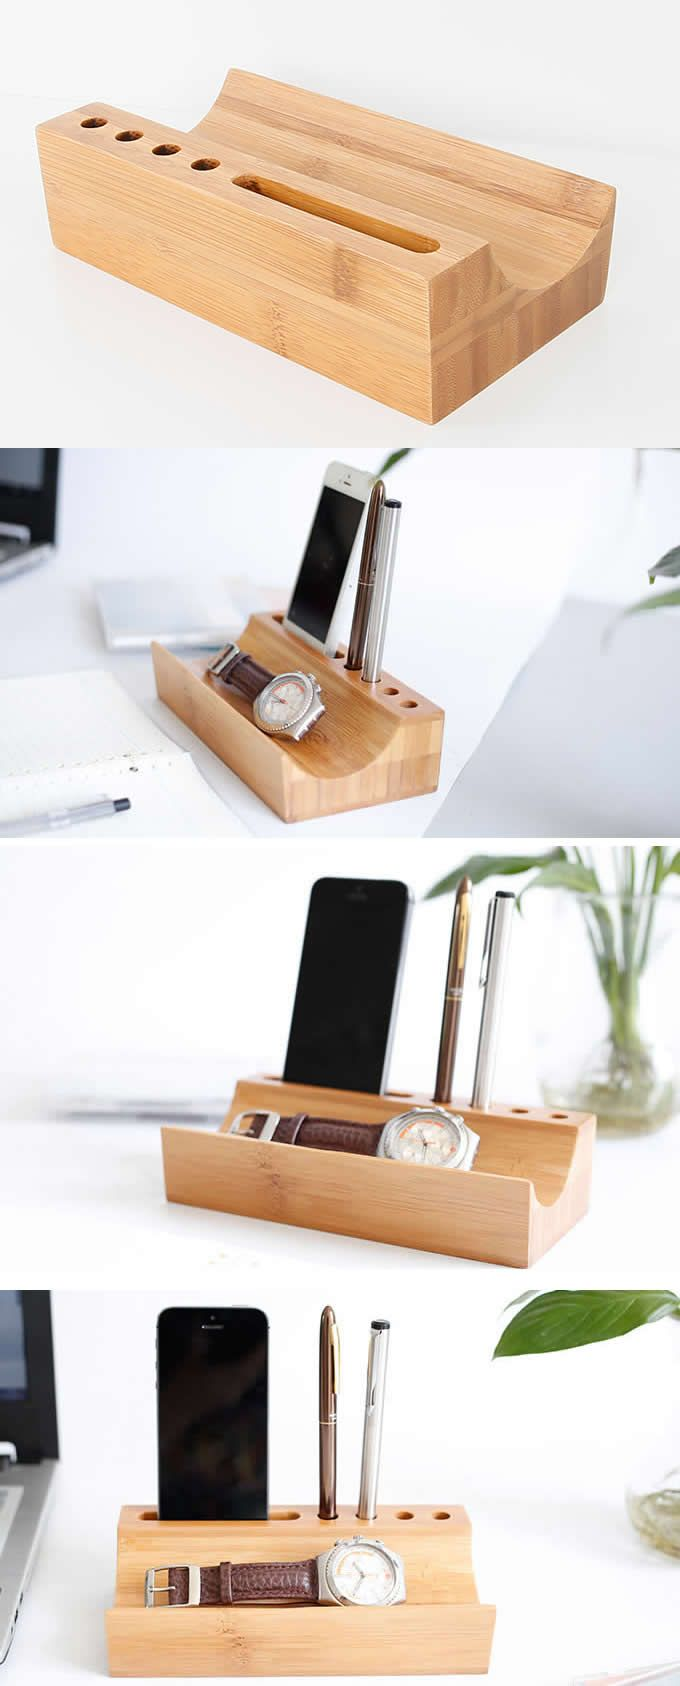 Wooden Bamboo Pen Pencil Stand Holder Smart Phone Dock